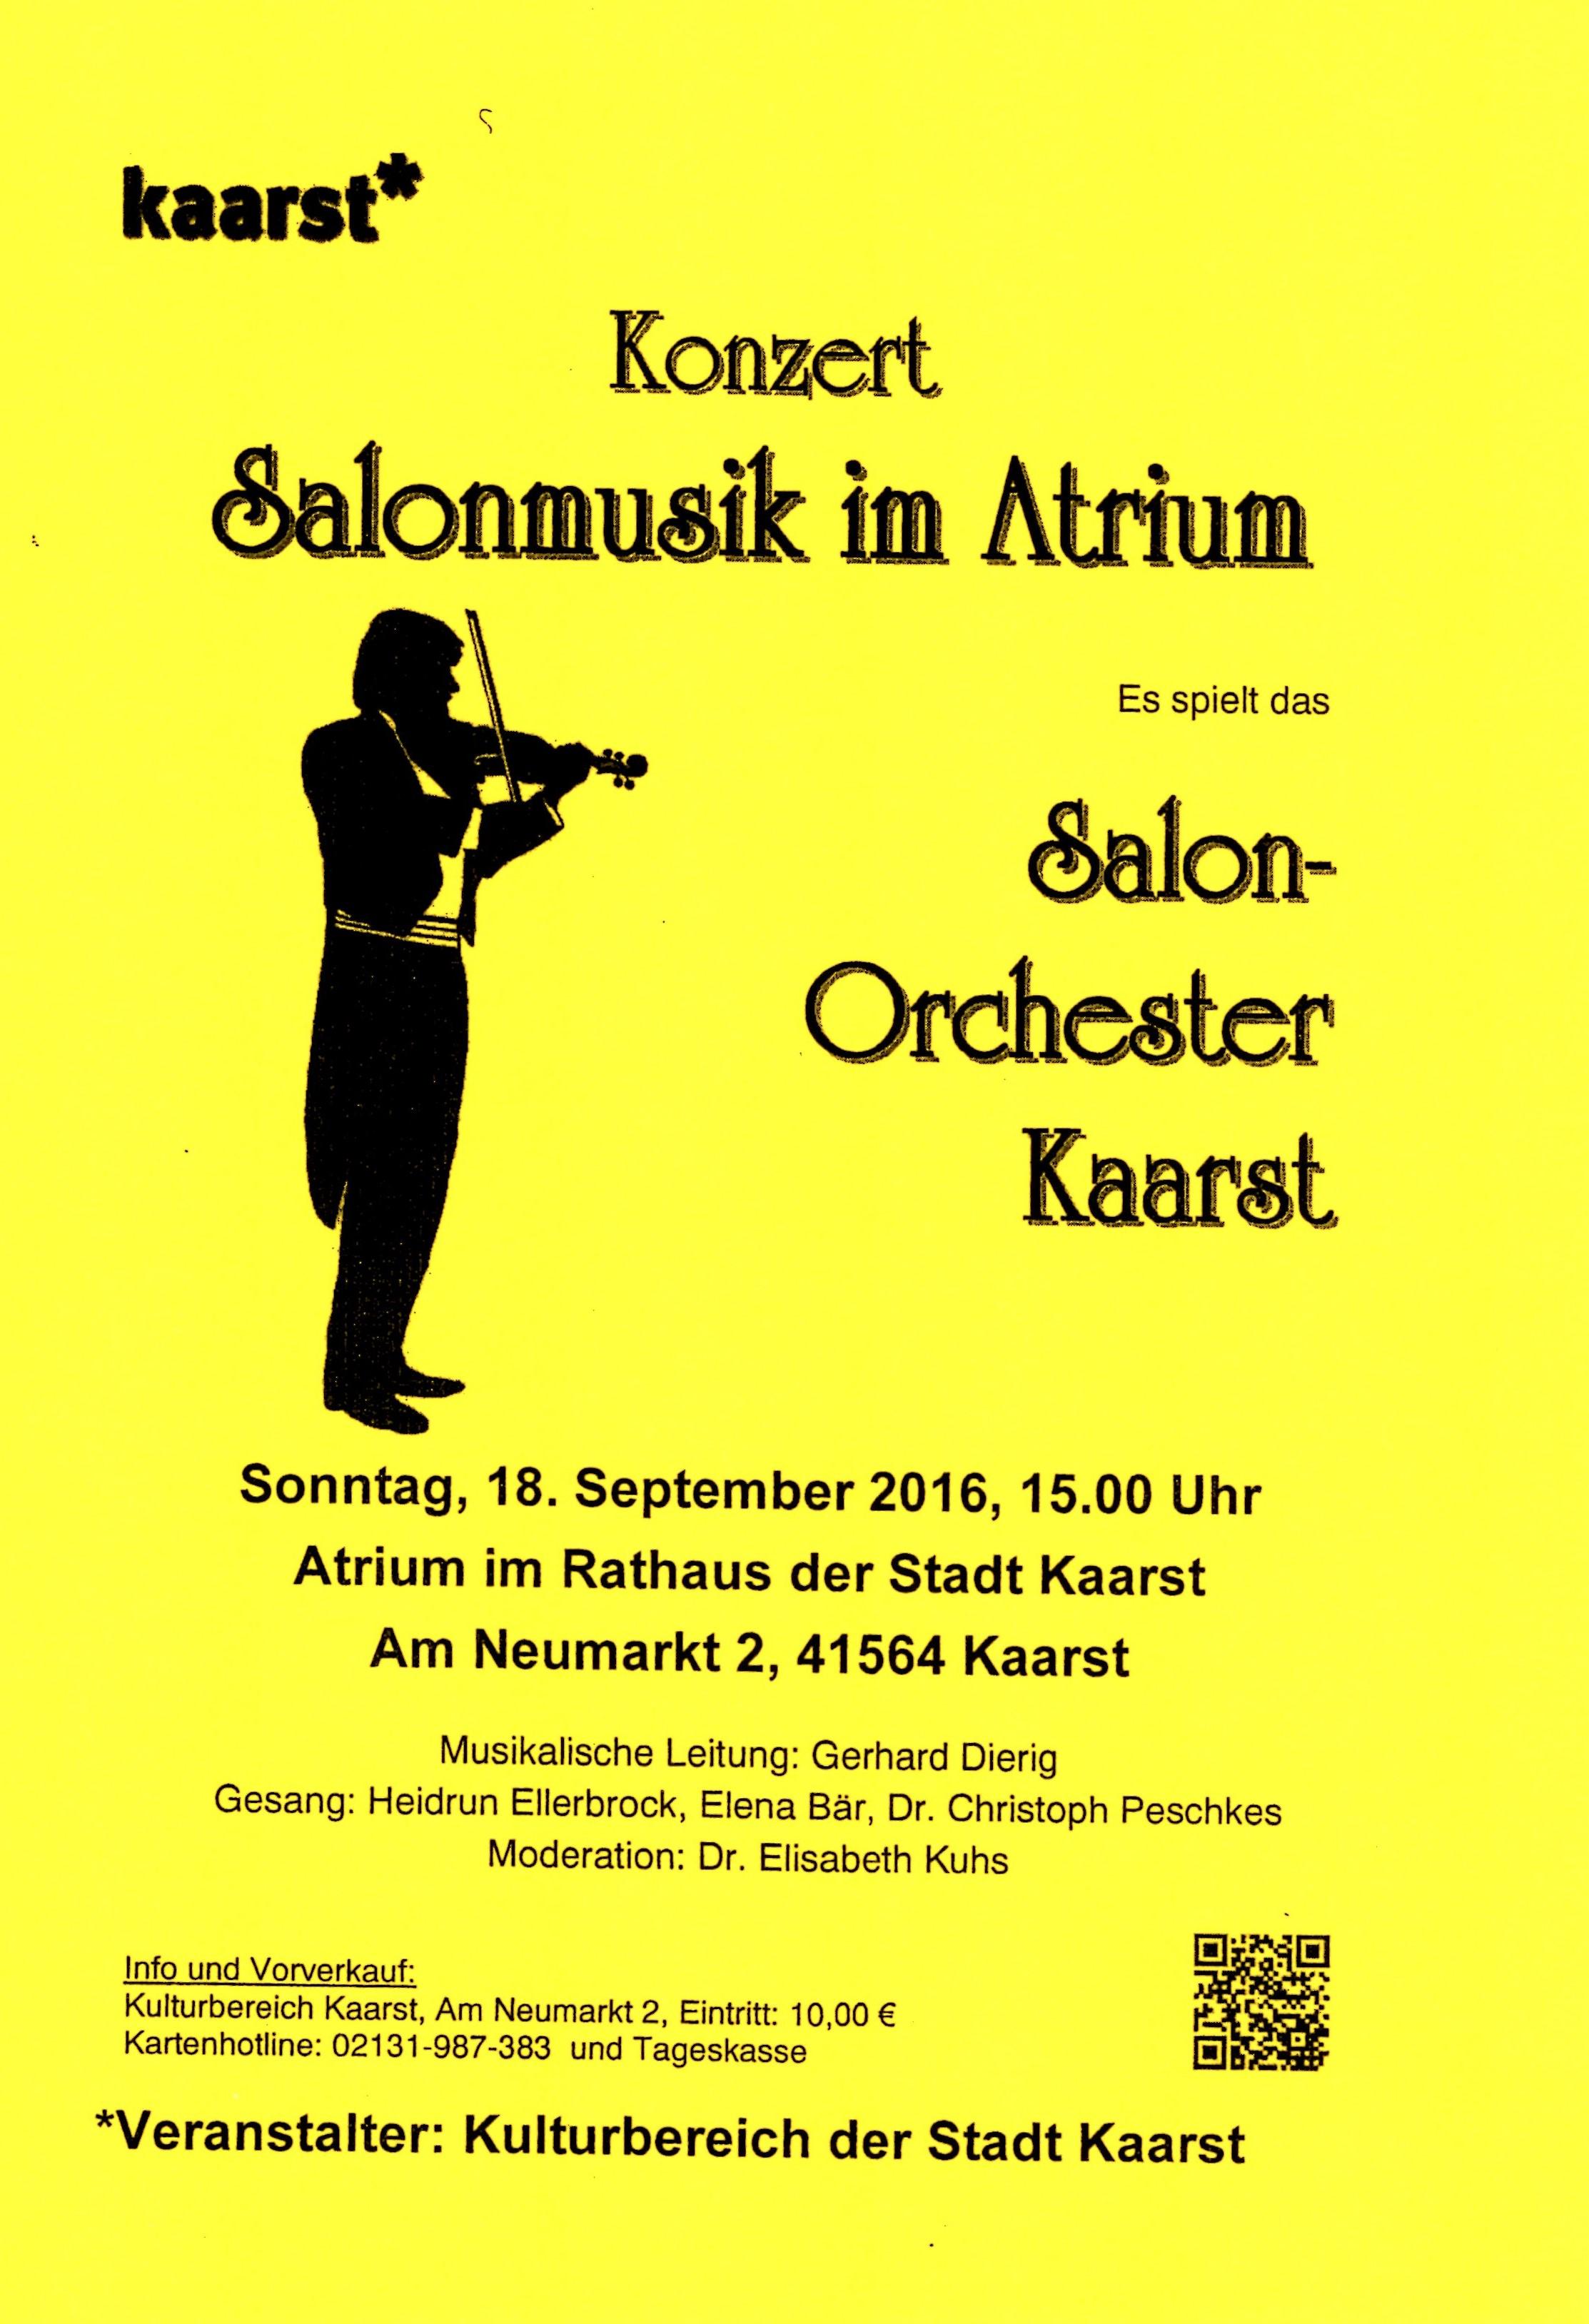 Konzert_im_Atrium_2016_09_18